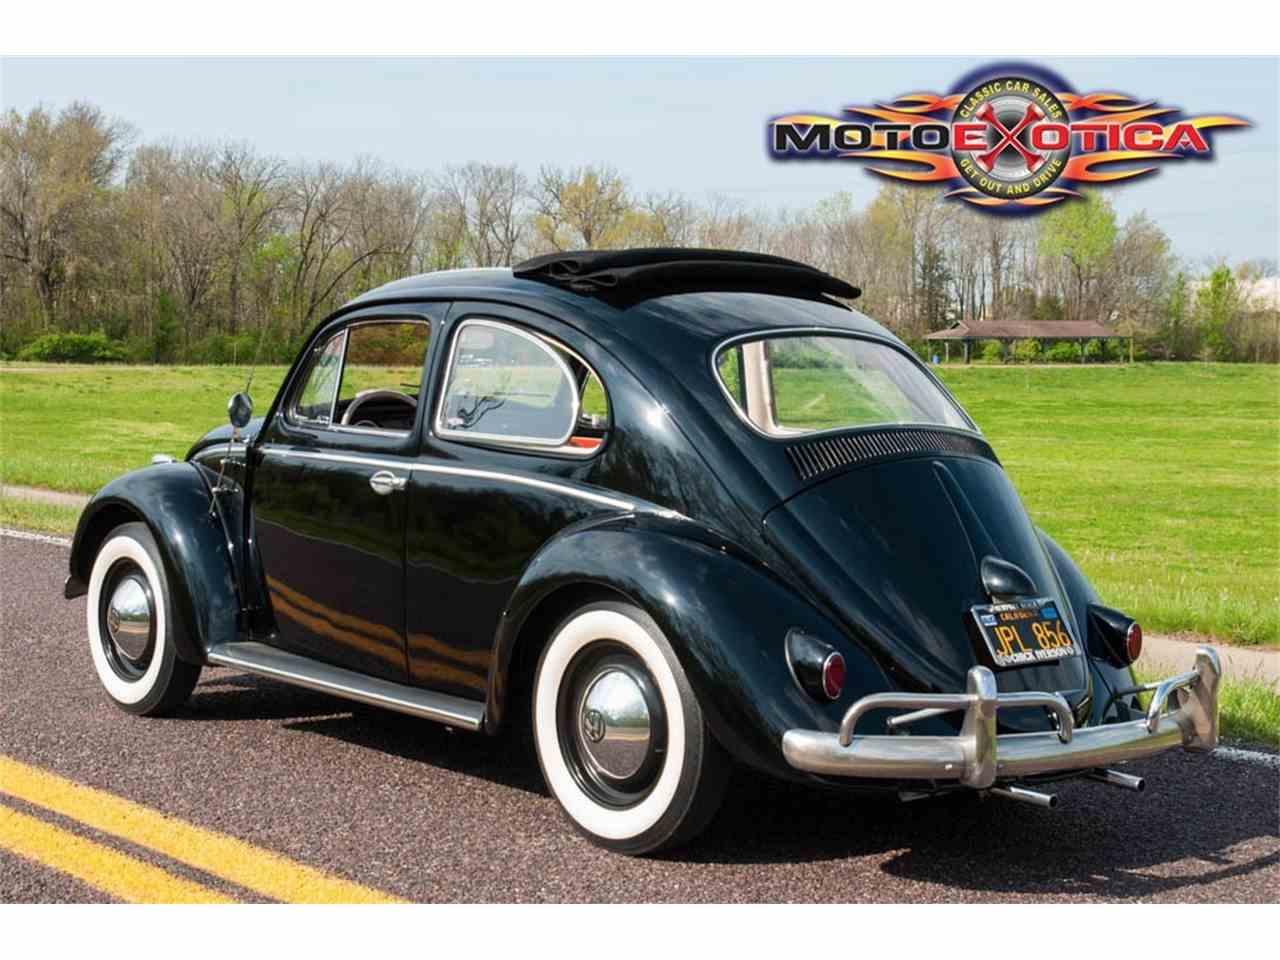 1958 Volkswagen Beetle For Sale Classiccars Com Cc 1070119